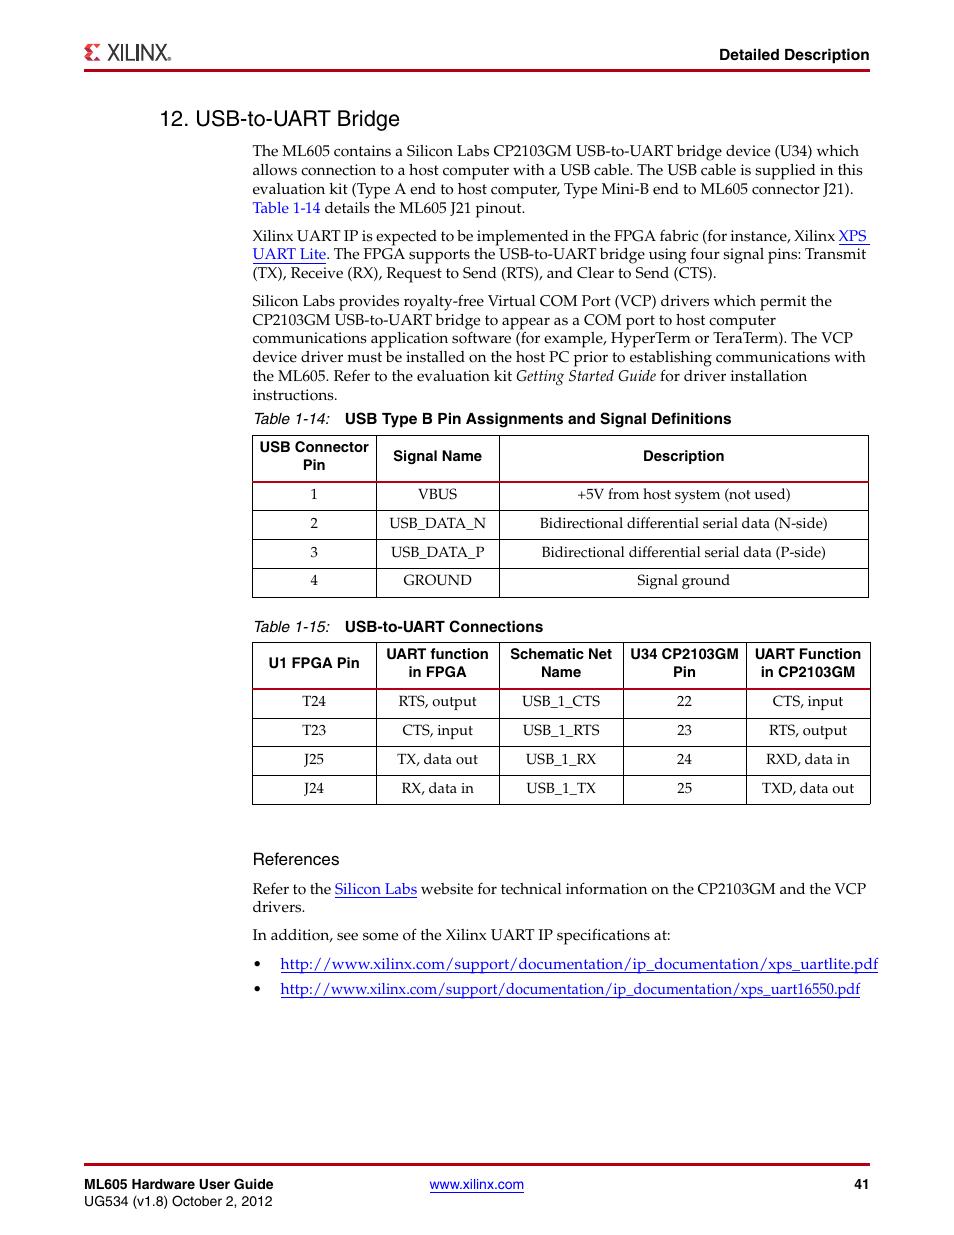 Usb-to-uart bridge, Pdated, Table 1-15 | Xilinx ML605 User ... on